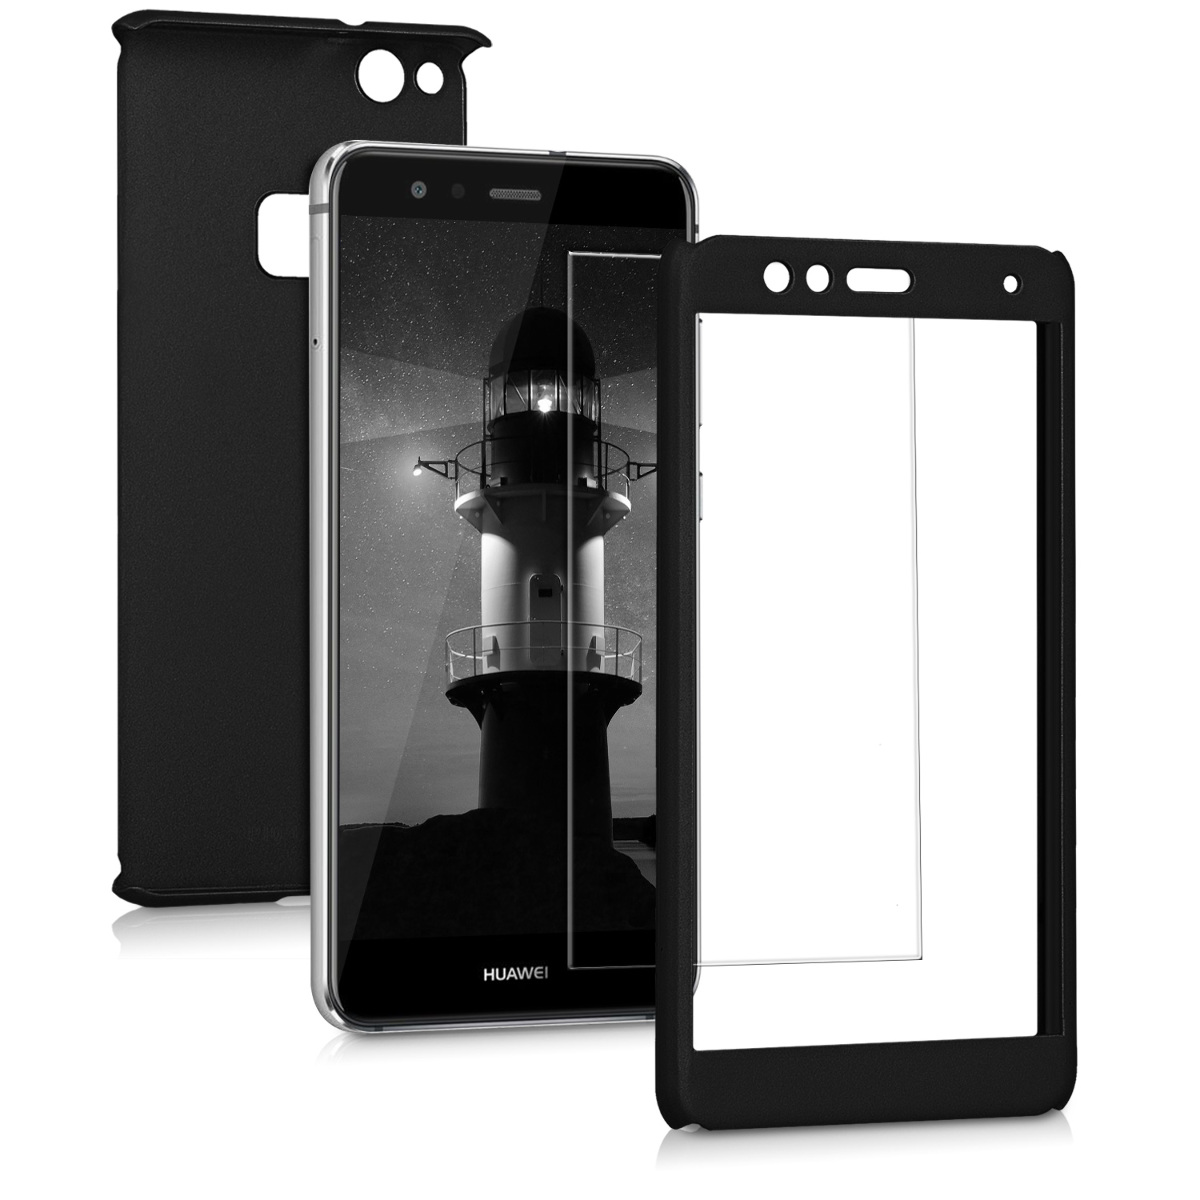 KW Θήκη Full Body Huawei P10 Lite & Tempered Glass - Metallic Black (43763.68)